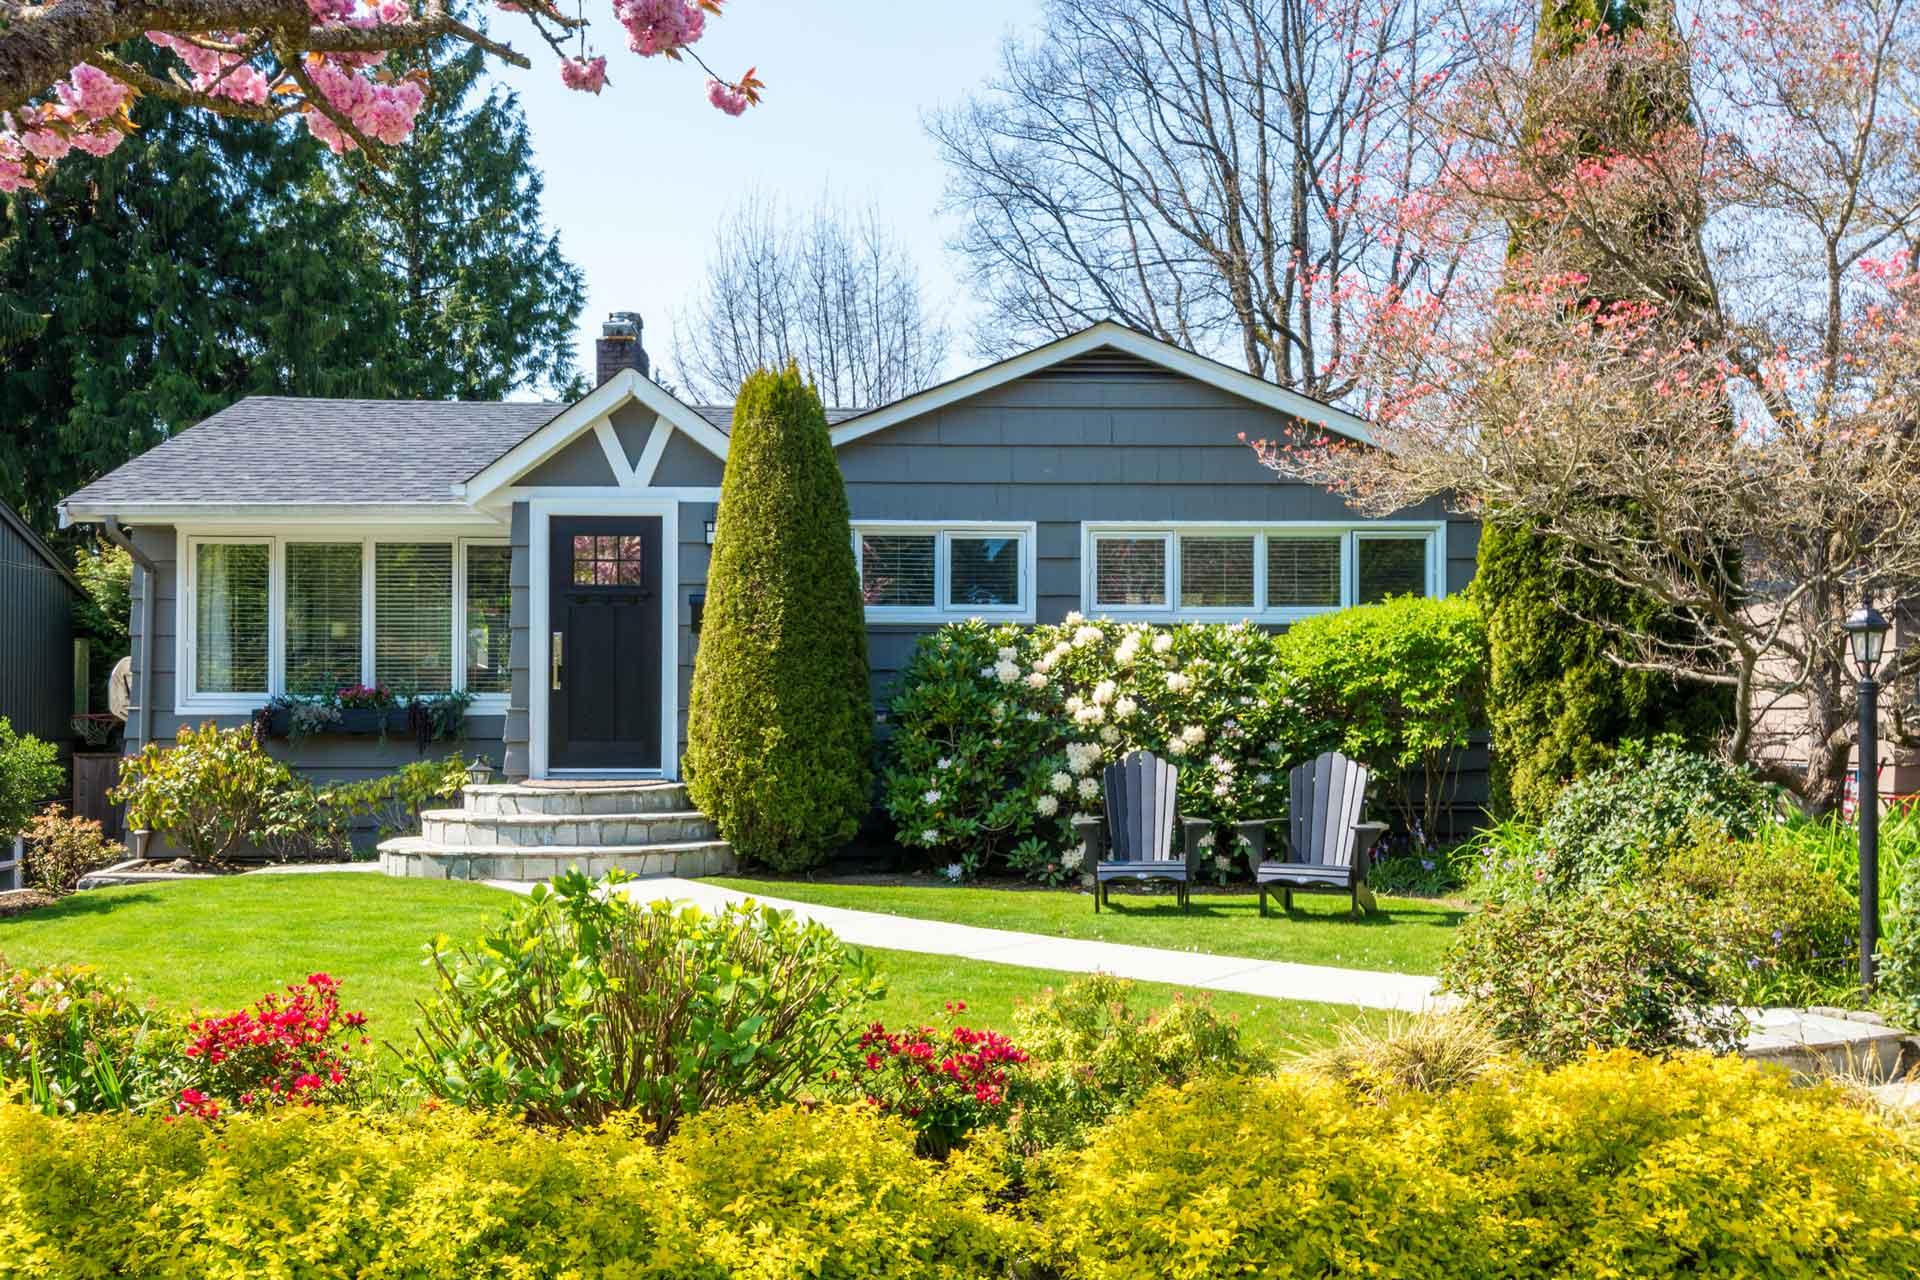 https://timbermart.ca/wp-content/uploads/2019/01/Home-exterior.jpg